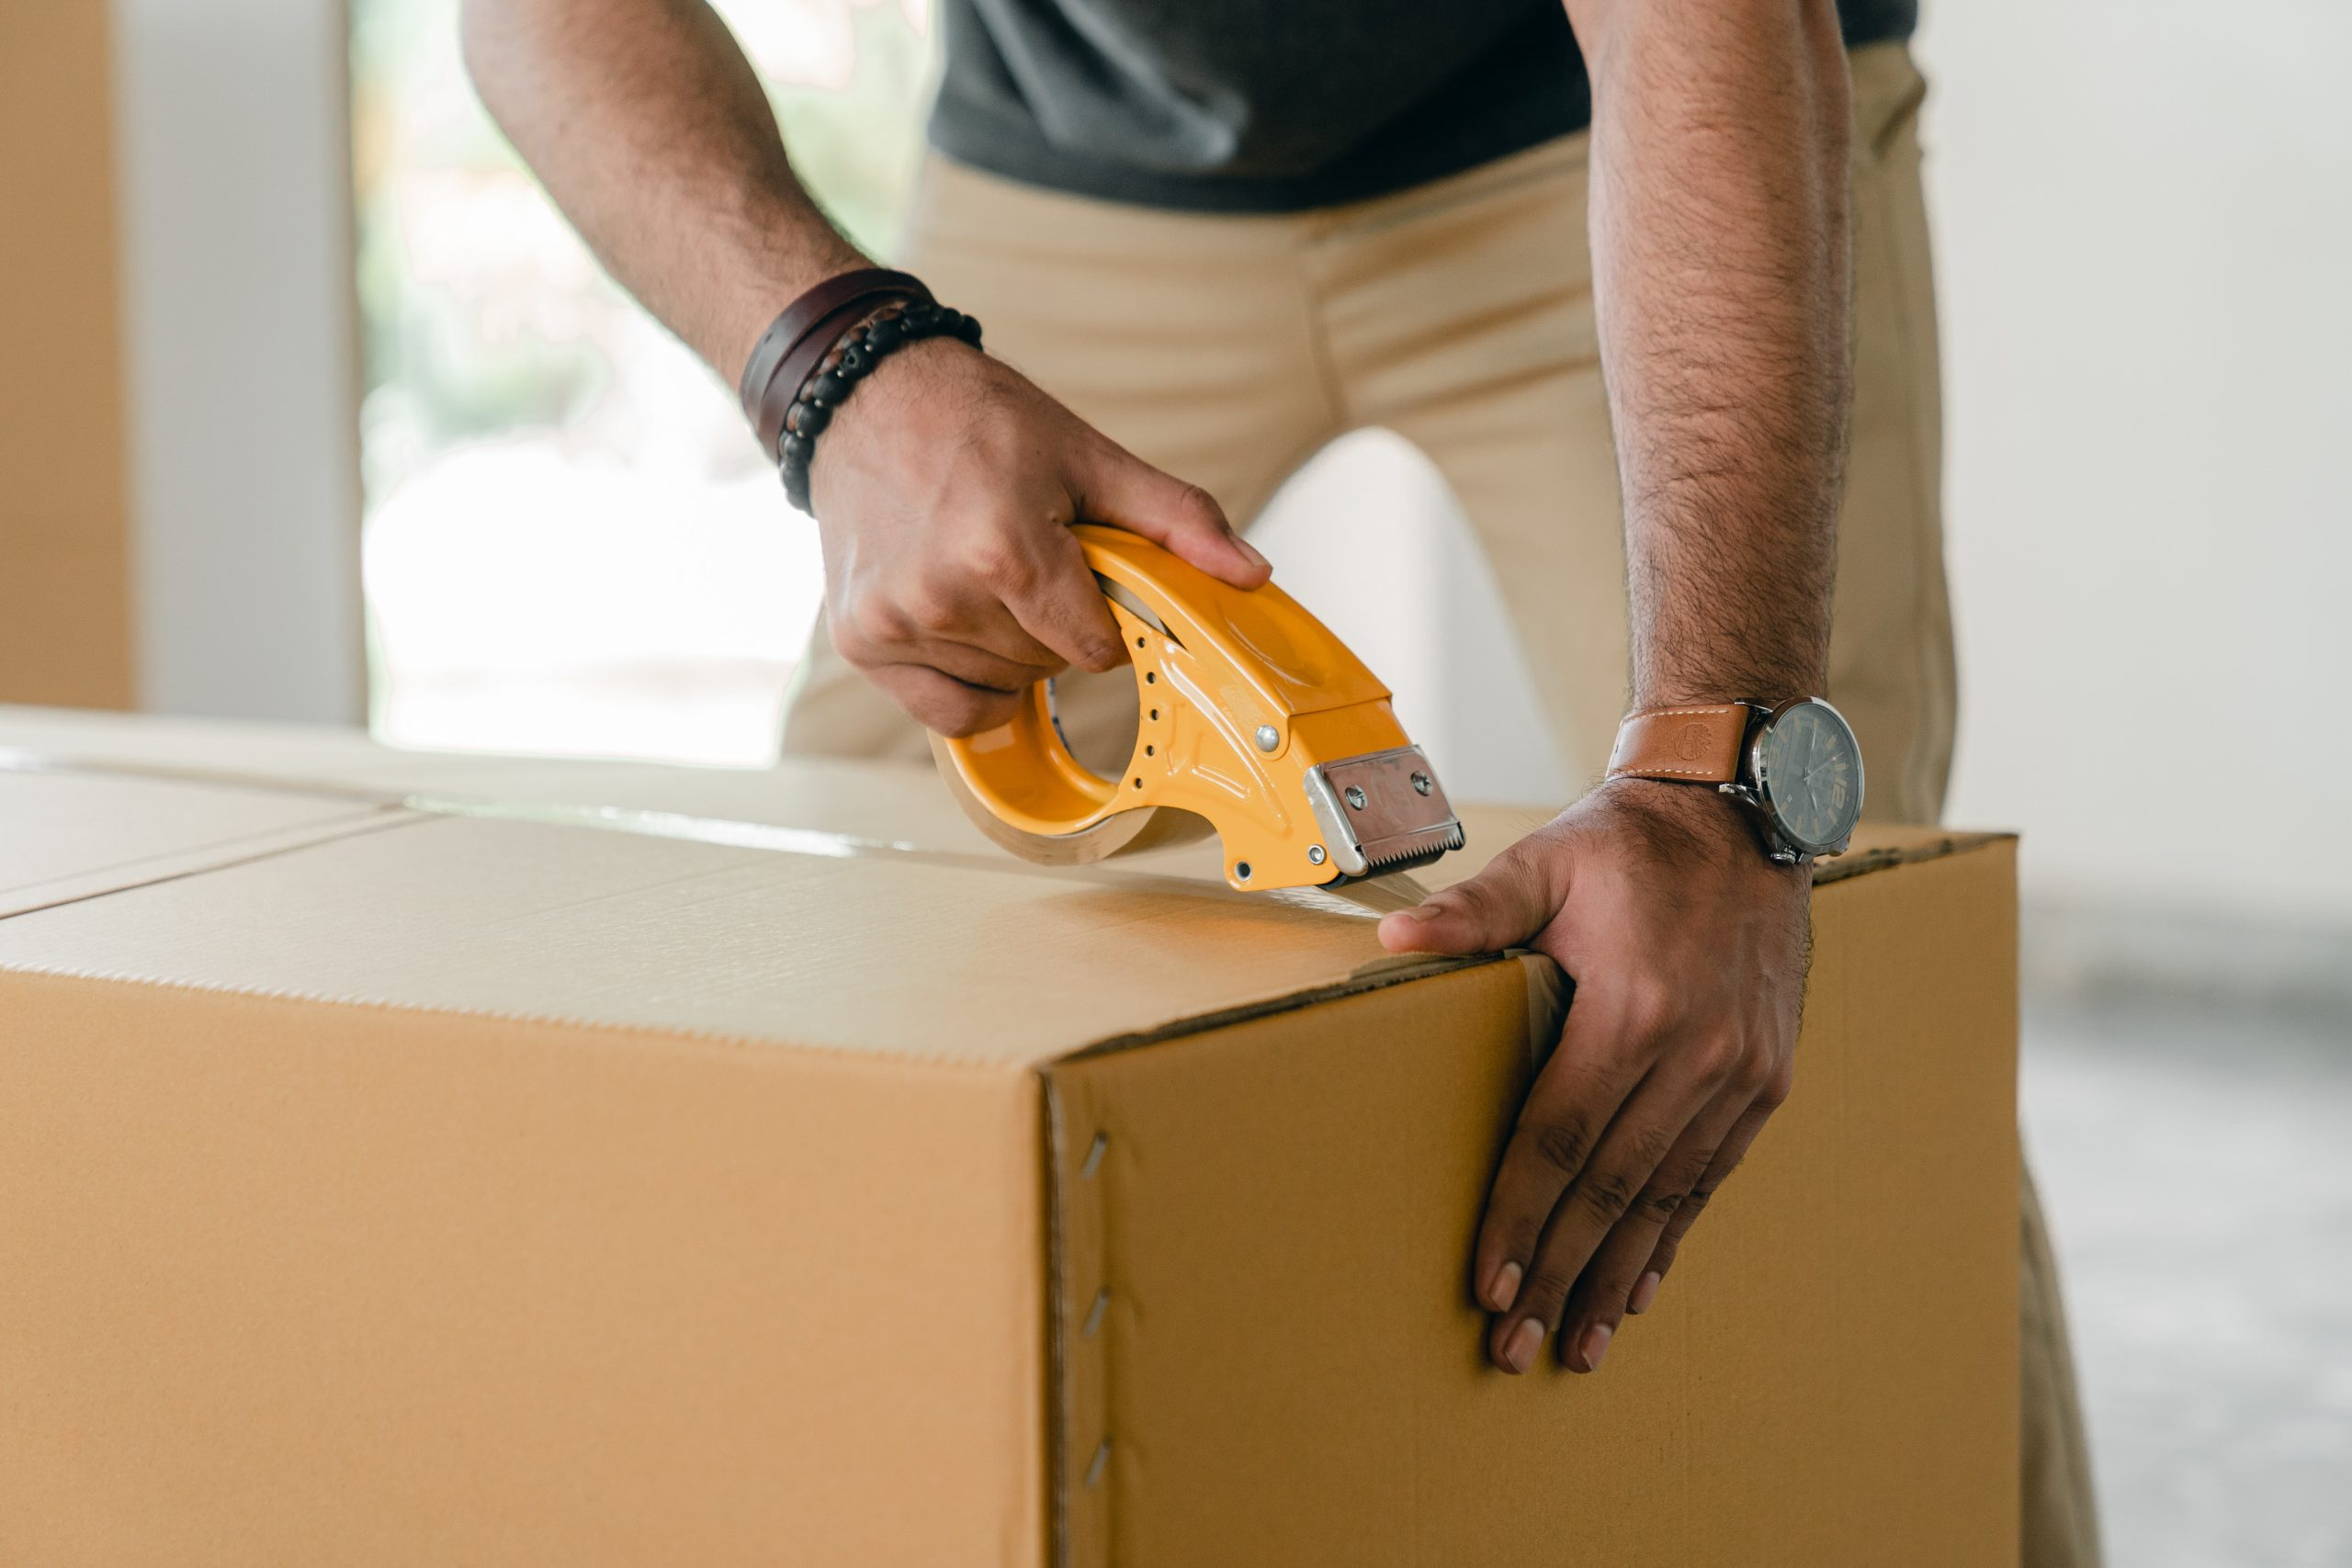 man taping a moving box closed